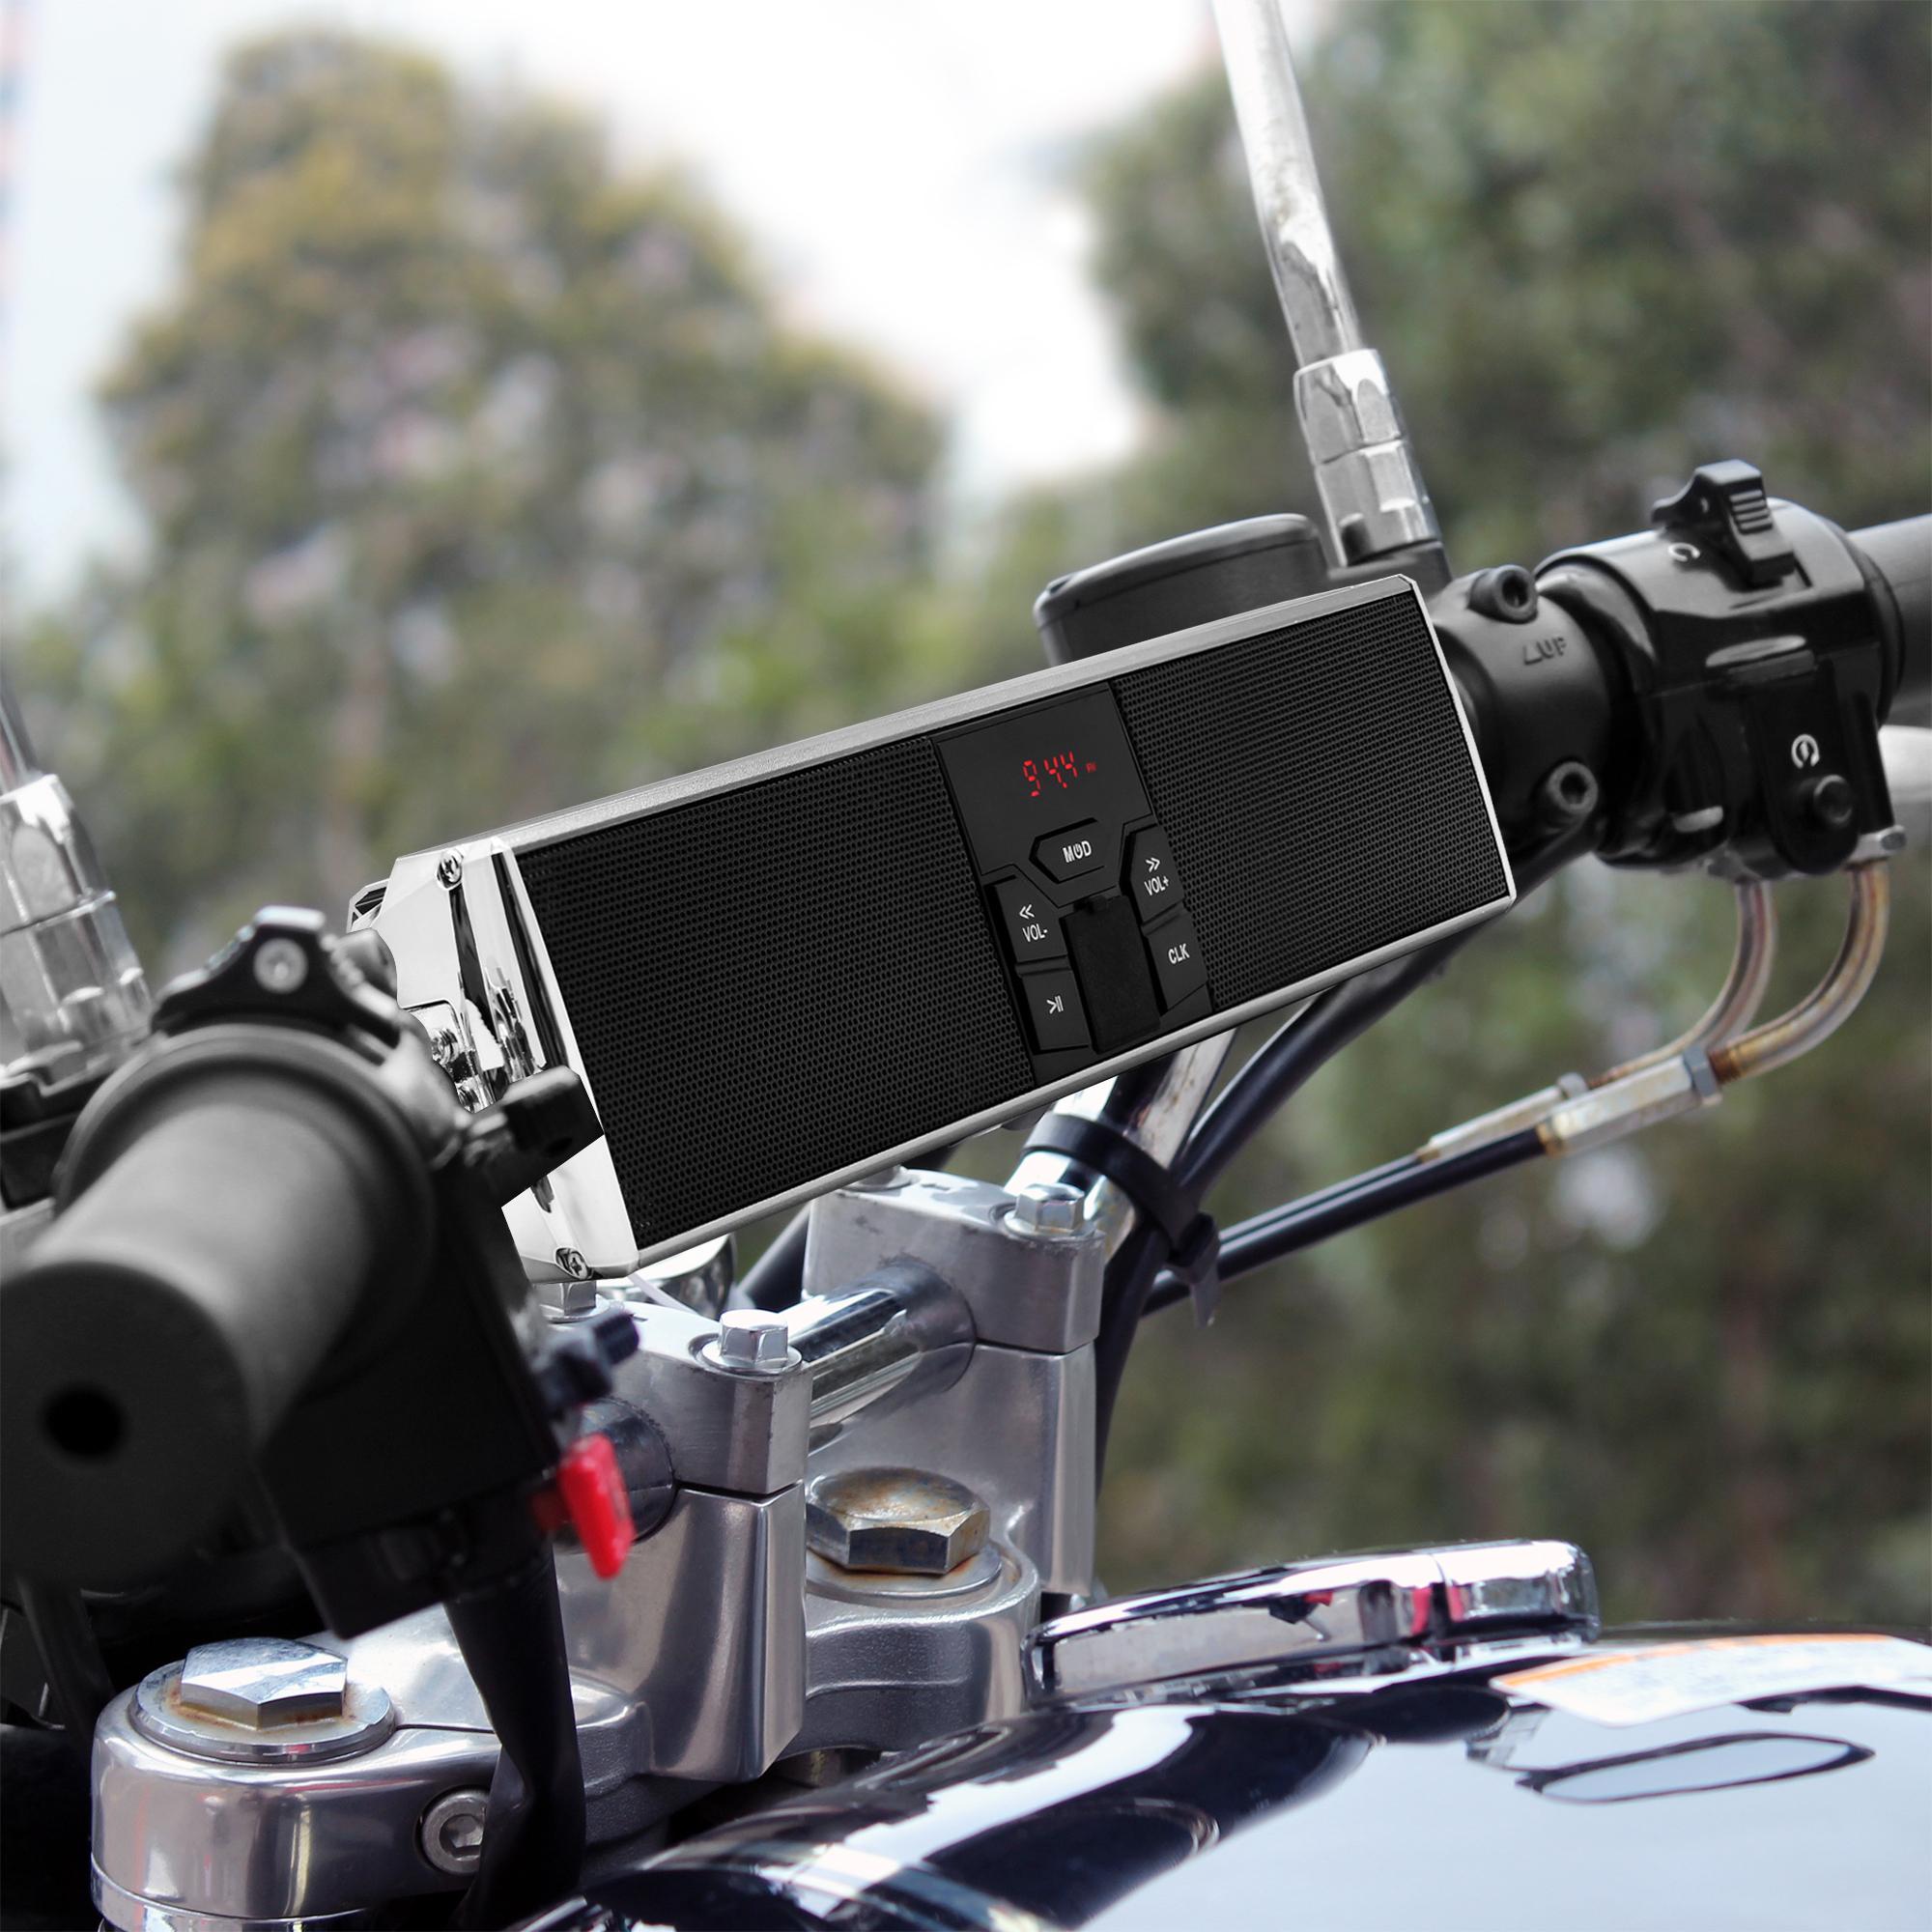 FM Radio Handlebar Mount MP3 Music Player Audio Amplifier System Scooter Bike ATV UTV RE9-X Silver GoldenHawk RE9-X Waterproof Bluetooth Wireless Motorcycle Stereo Speakers 7//8-1.25 in USB